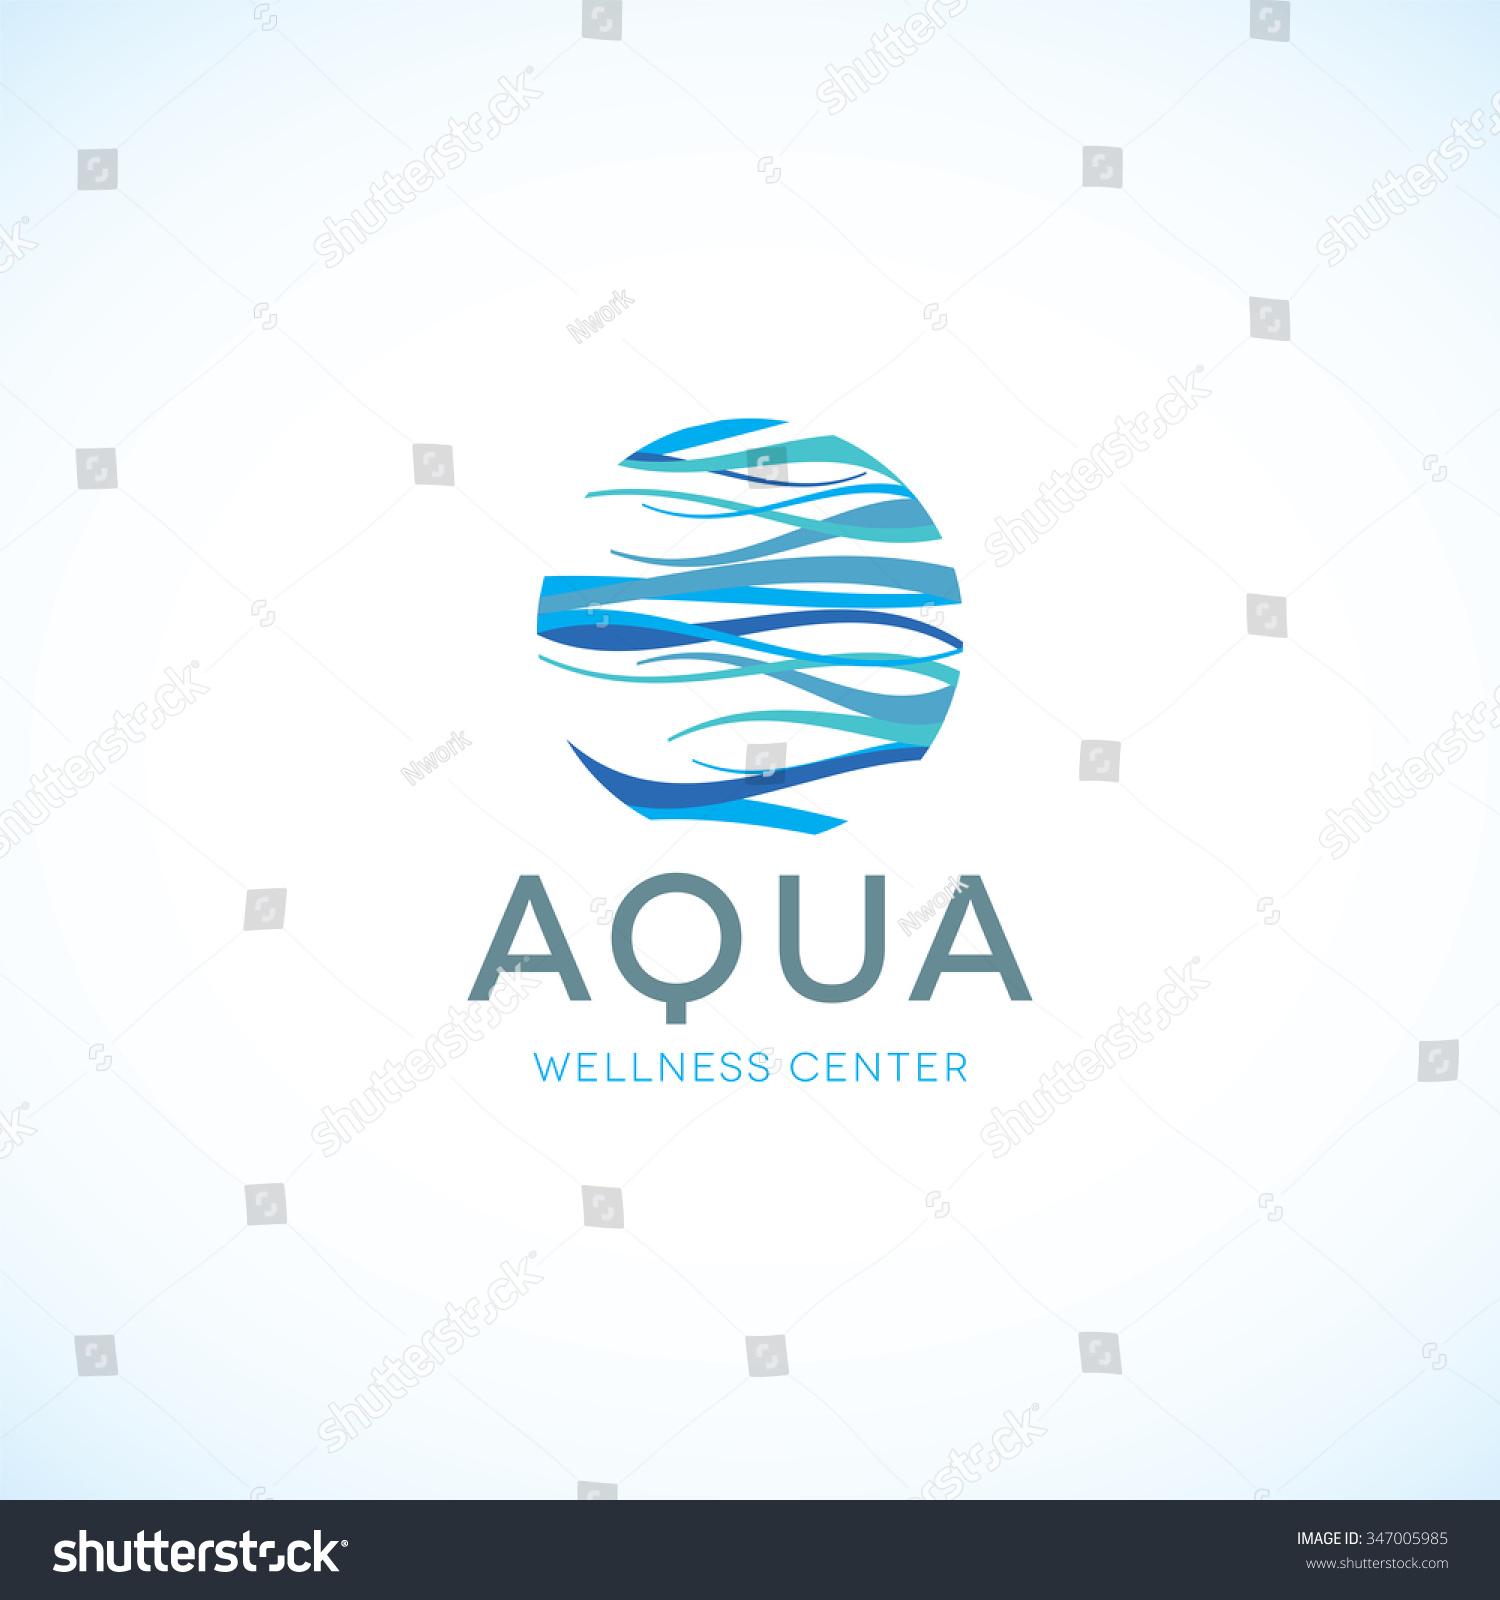 Spa wellness logo  Water Logo Aqua Logo Wellness Logo Stock-vektorgrafik 347005985 ...